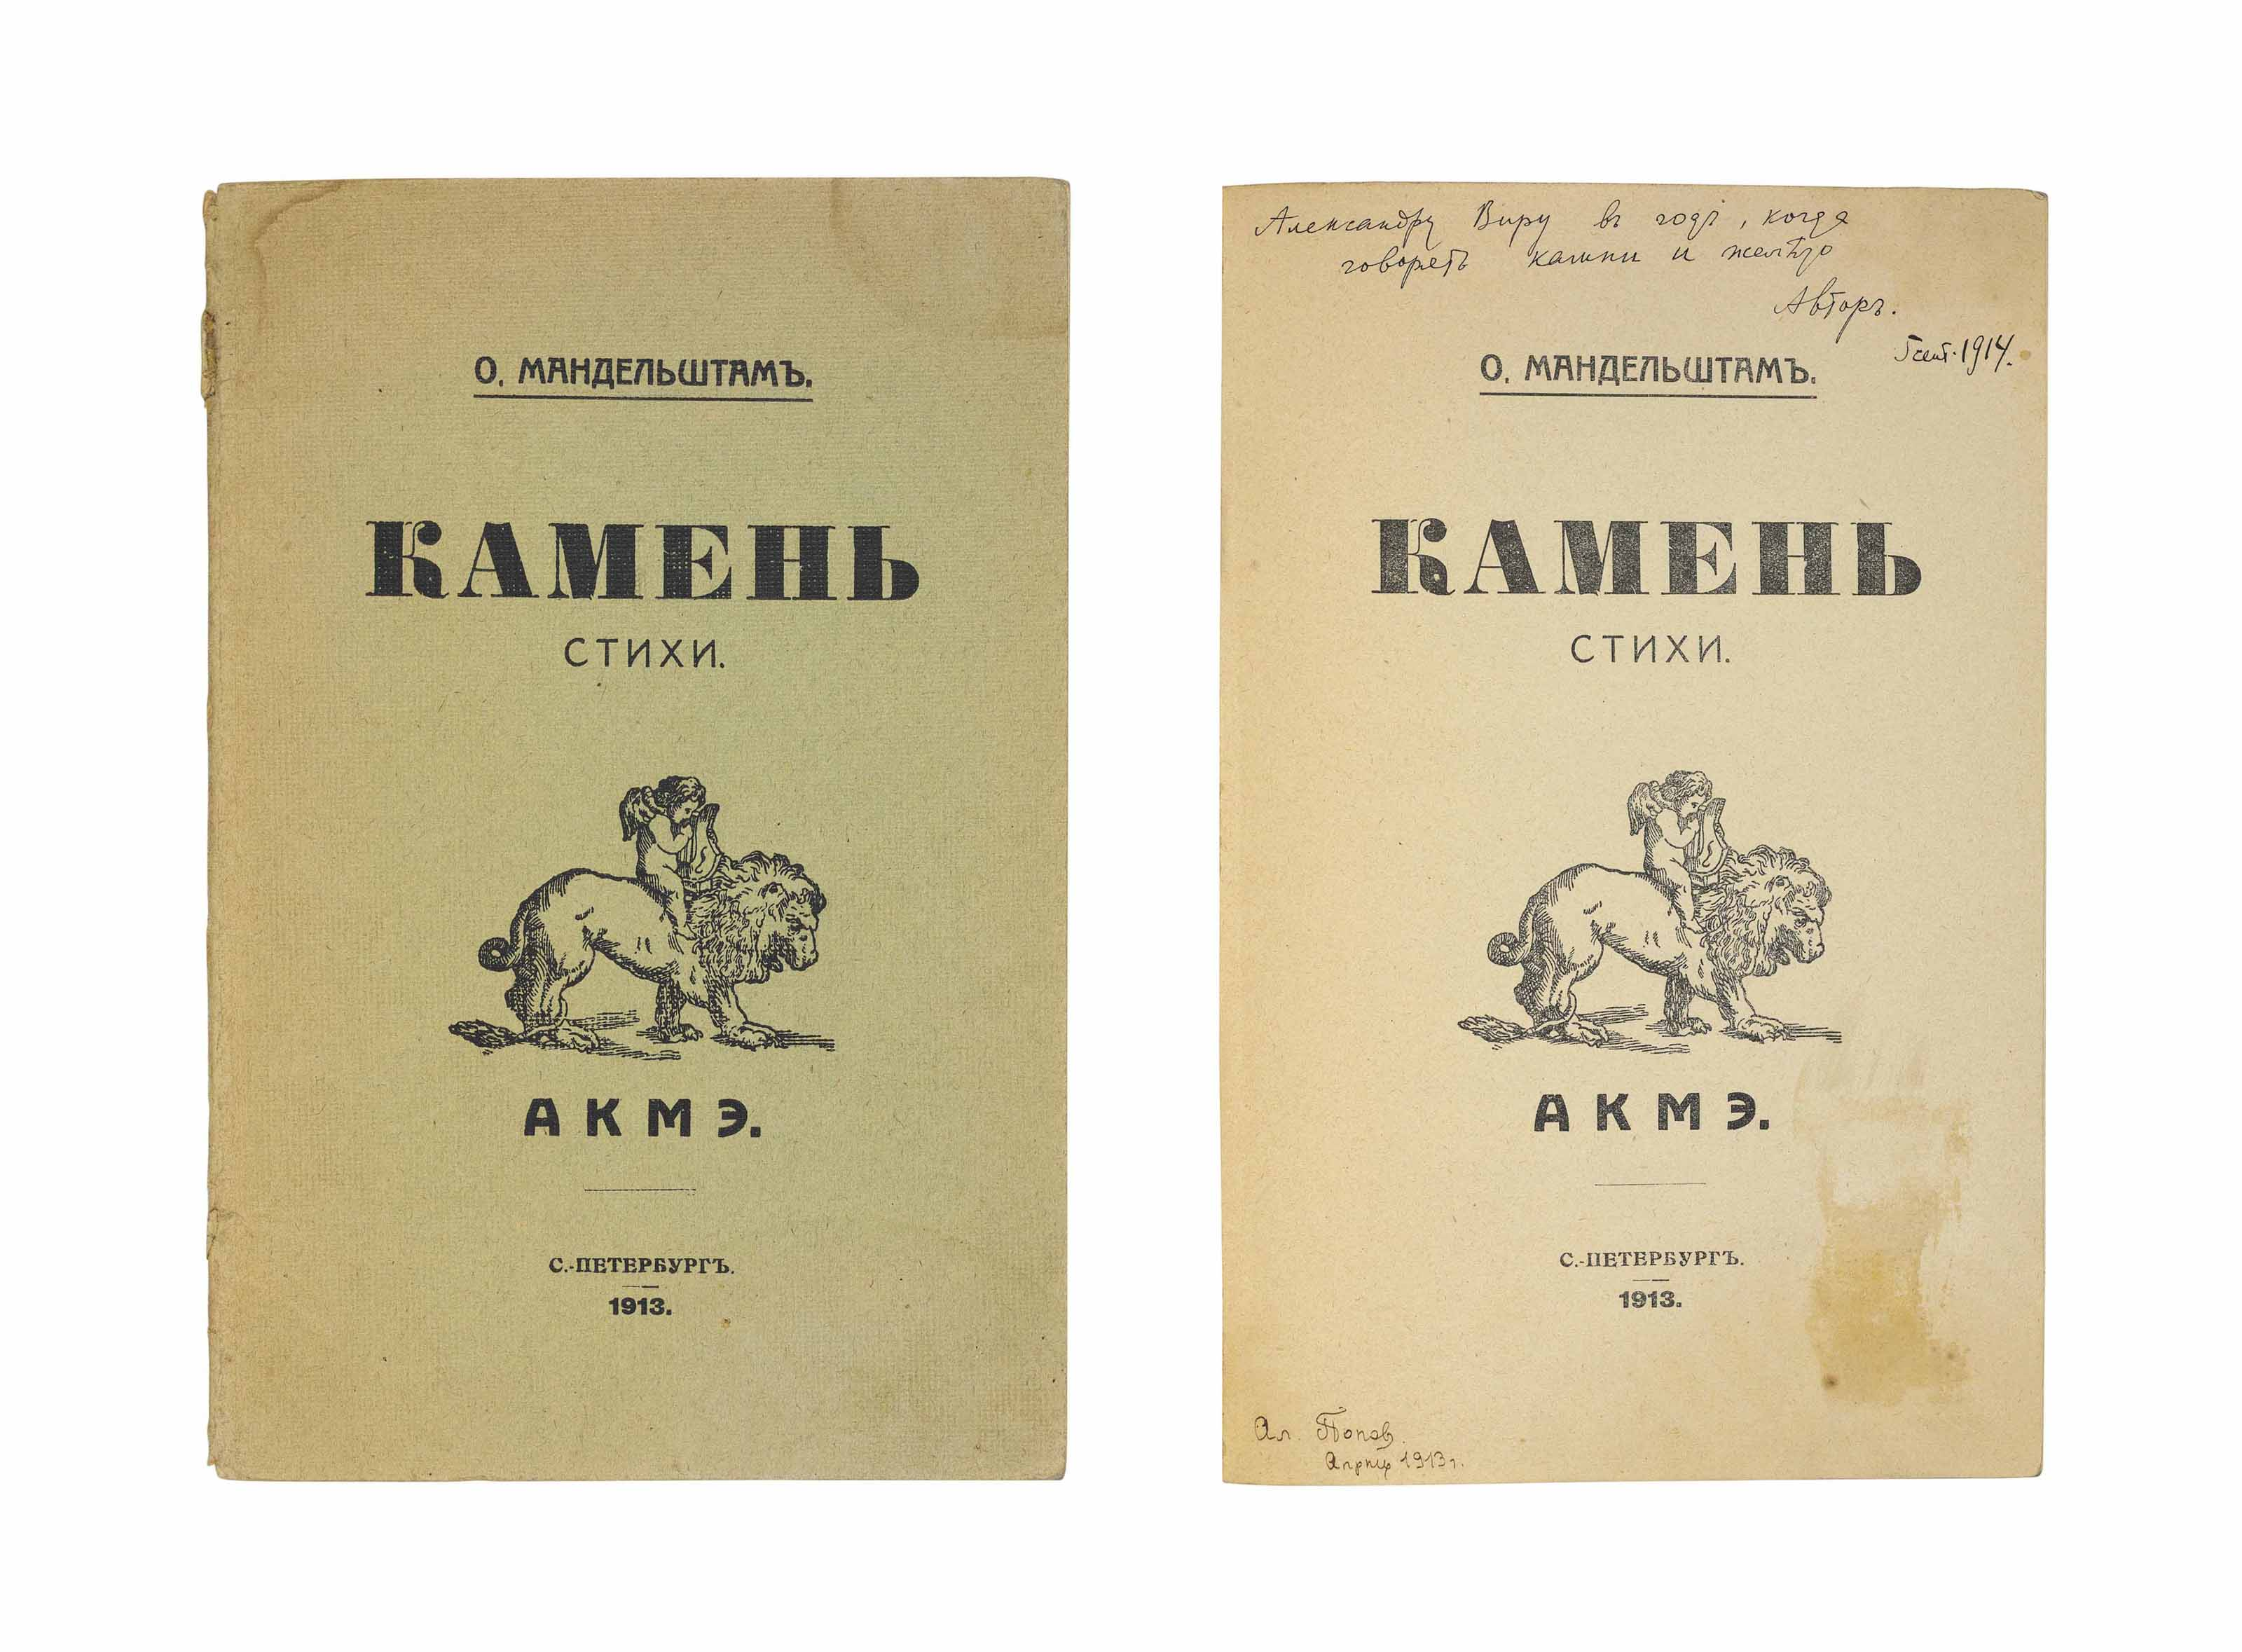 MANDELSHTAM, Osip Emil'evich (1891-1938). Kamen. [Stone.] St. Petersburg: Akme [but printed at the author's expense by Iu. Mansfeld], 1913.